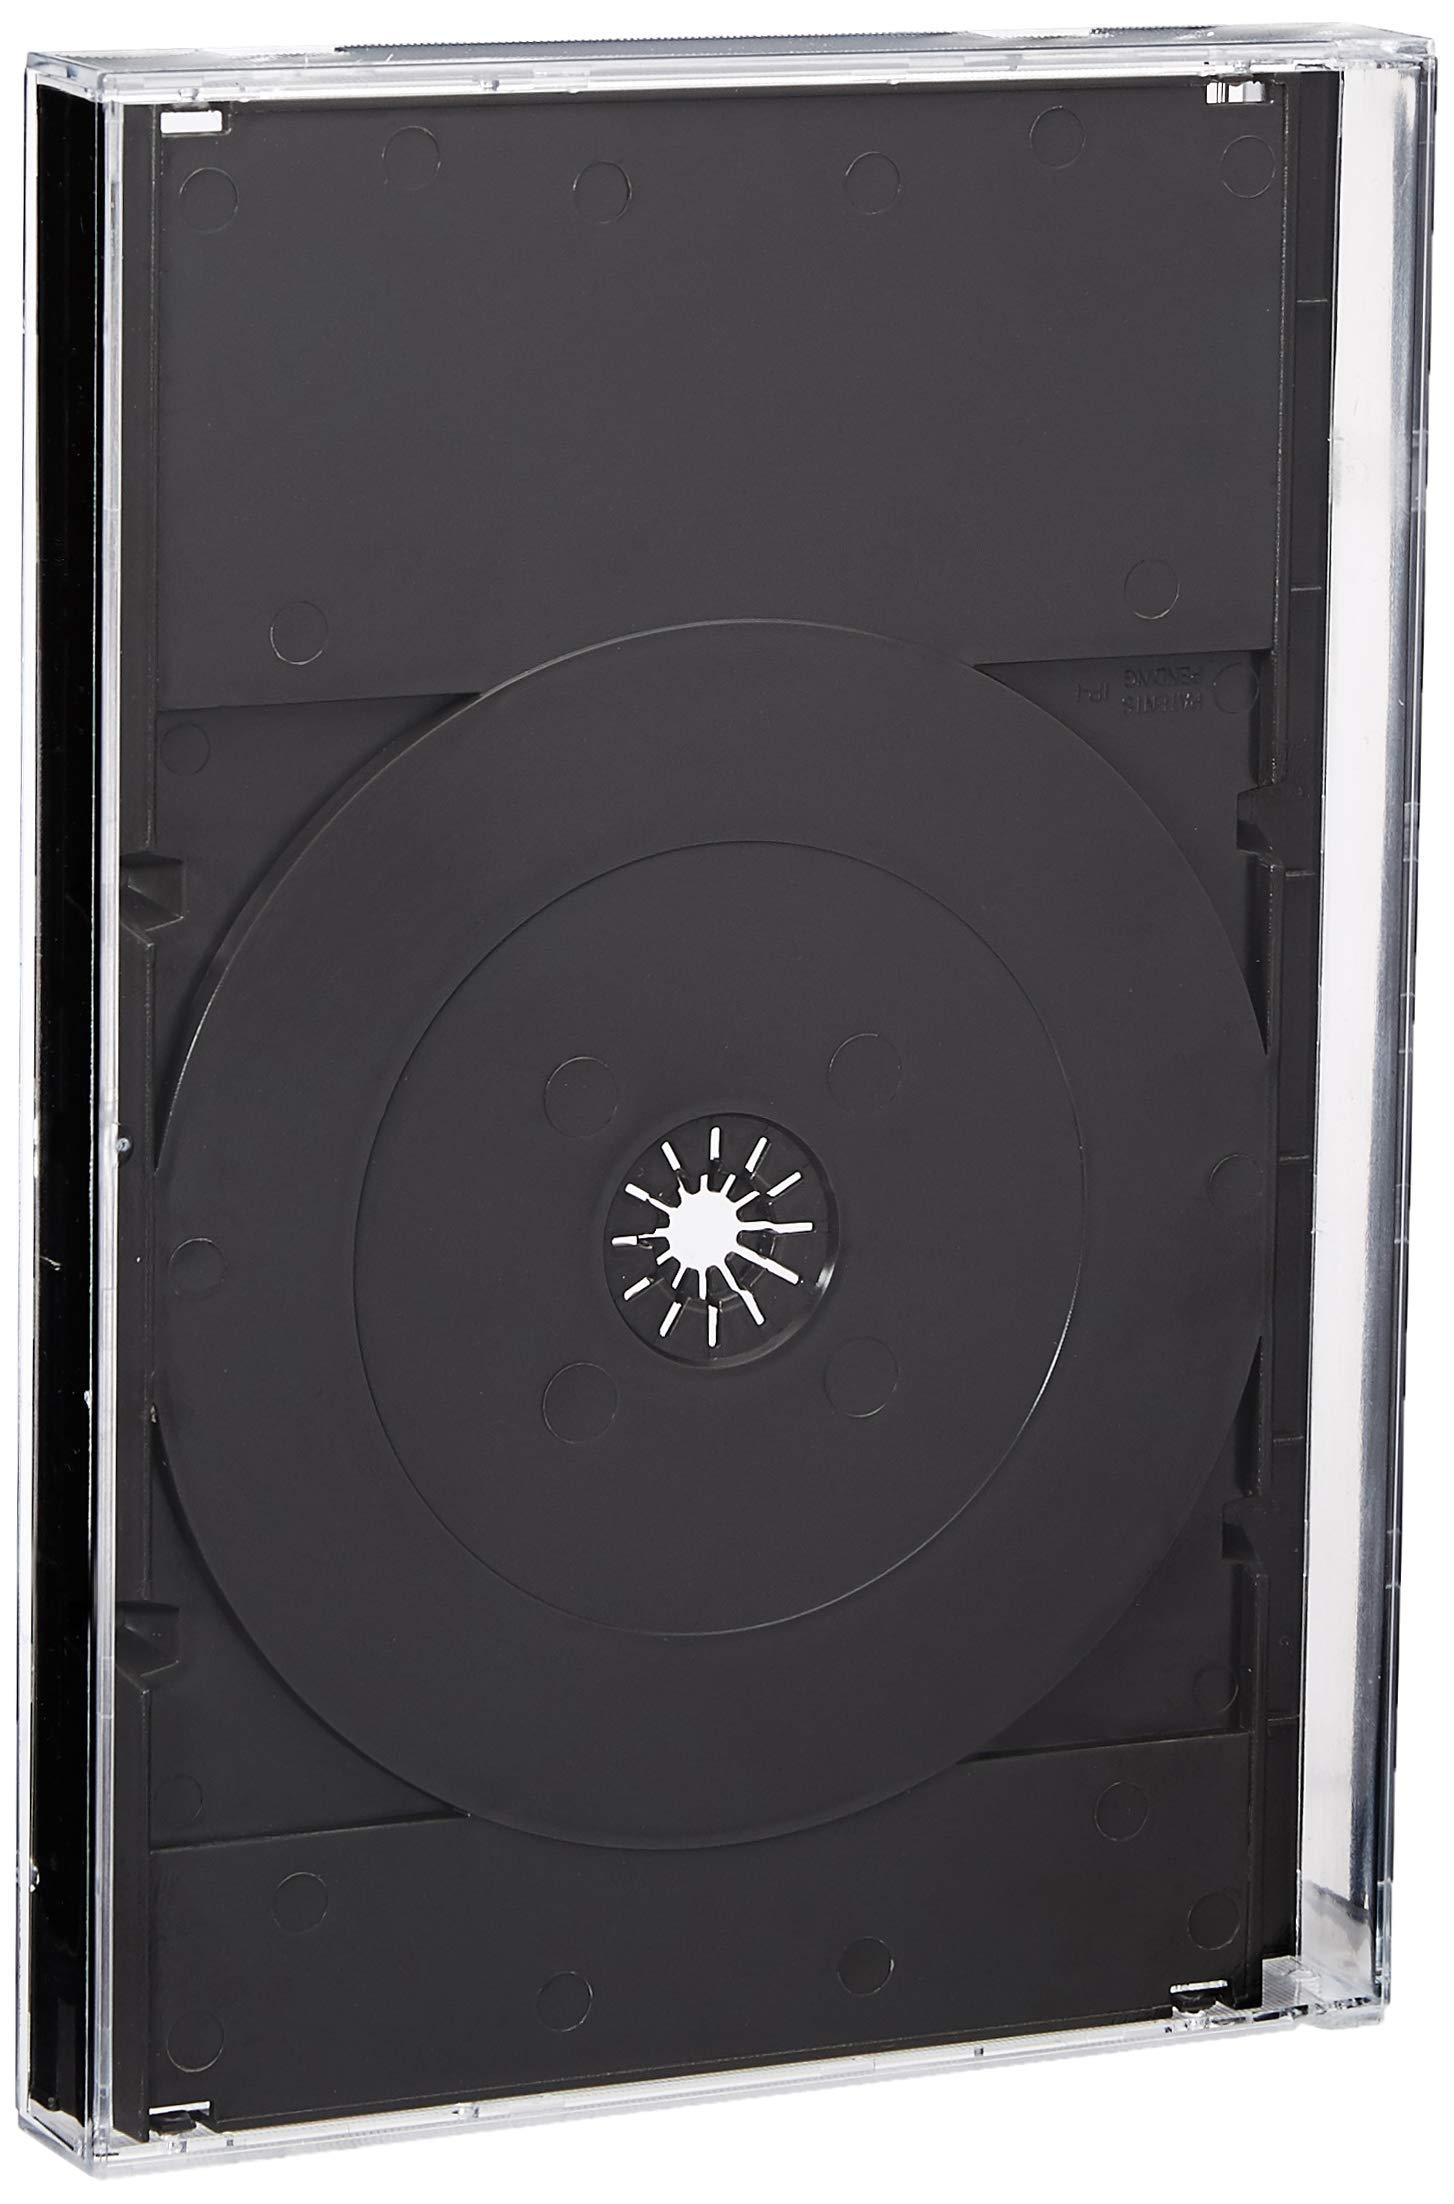 Sega CD / Sega Saturn replacement game cases 10 pack **SECOND RUN** by VGC online (Image #3)